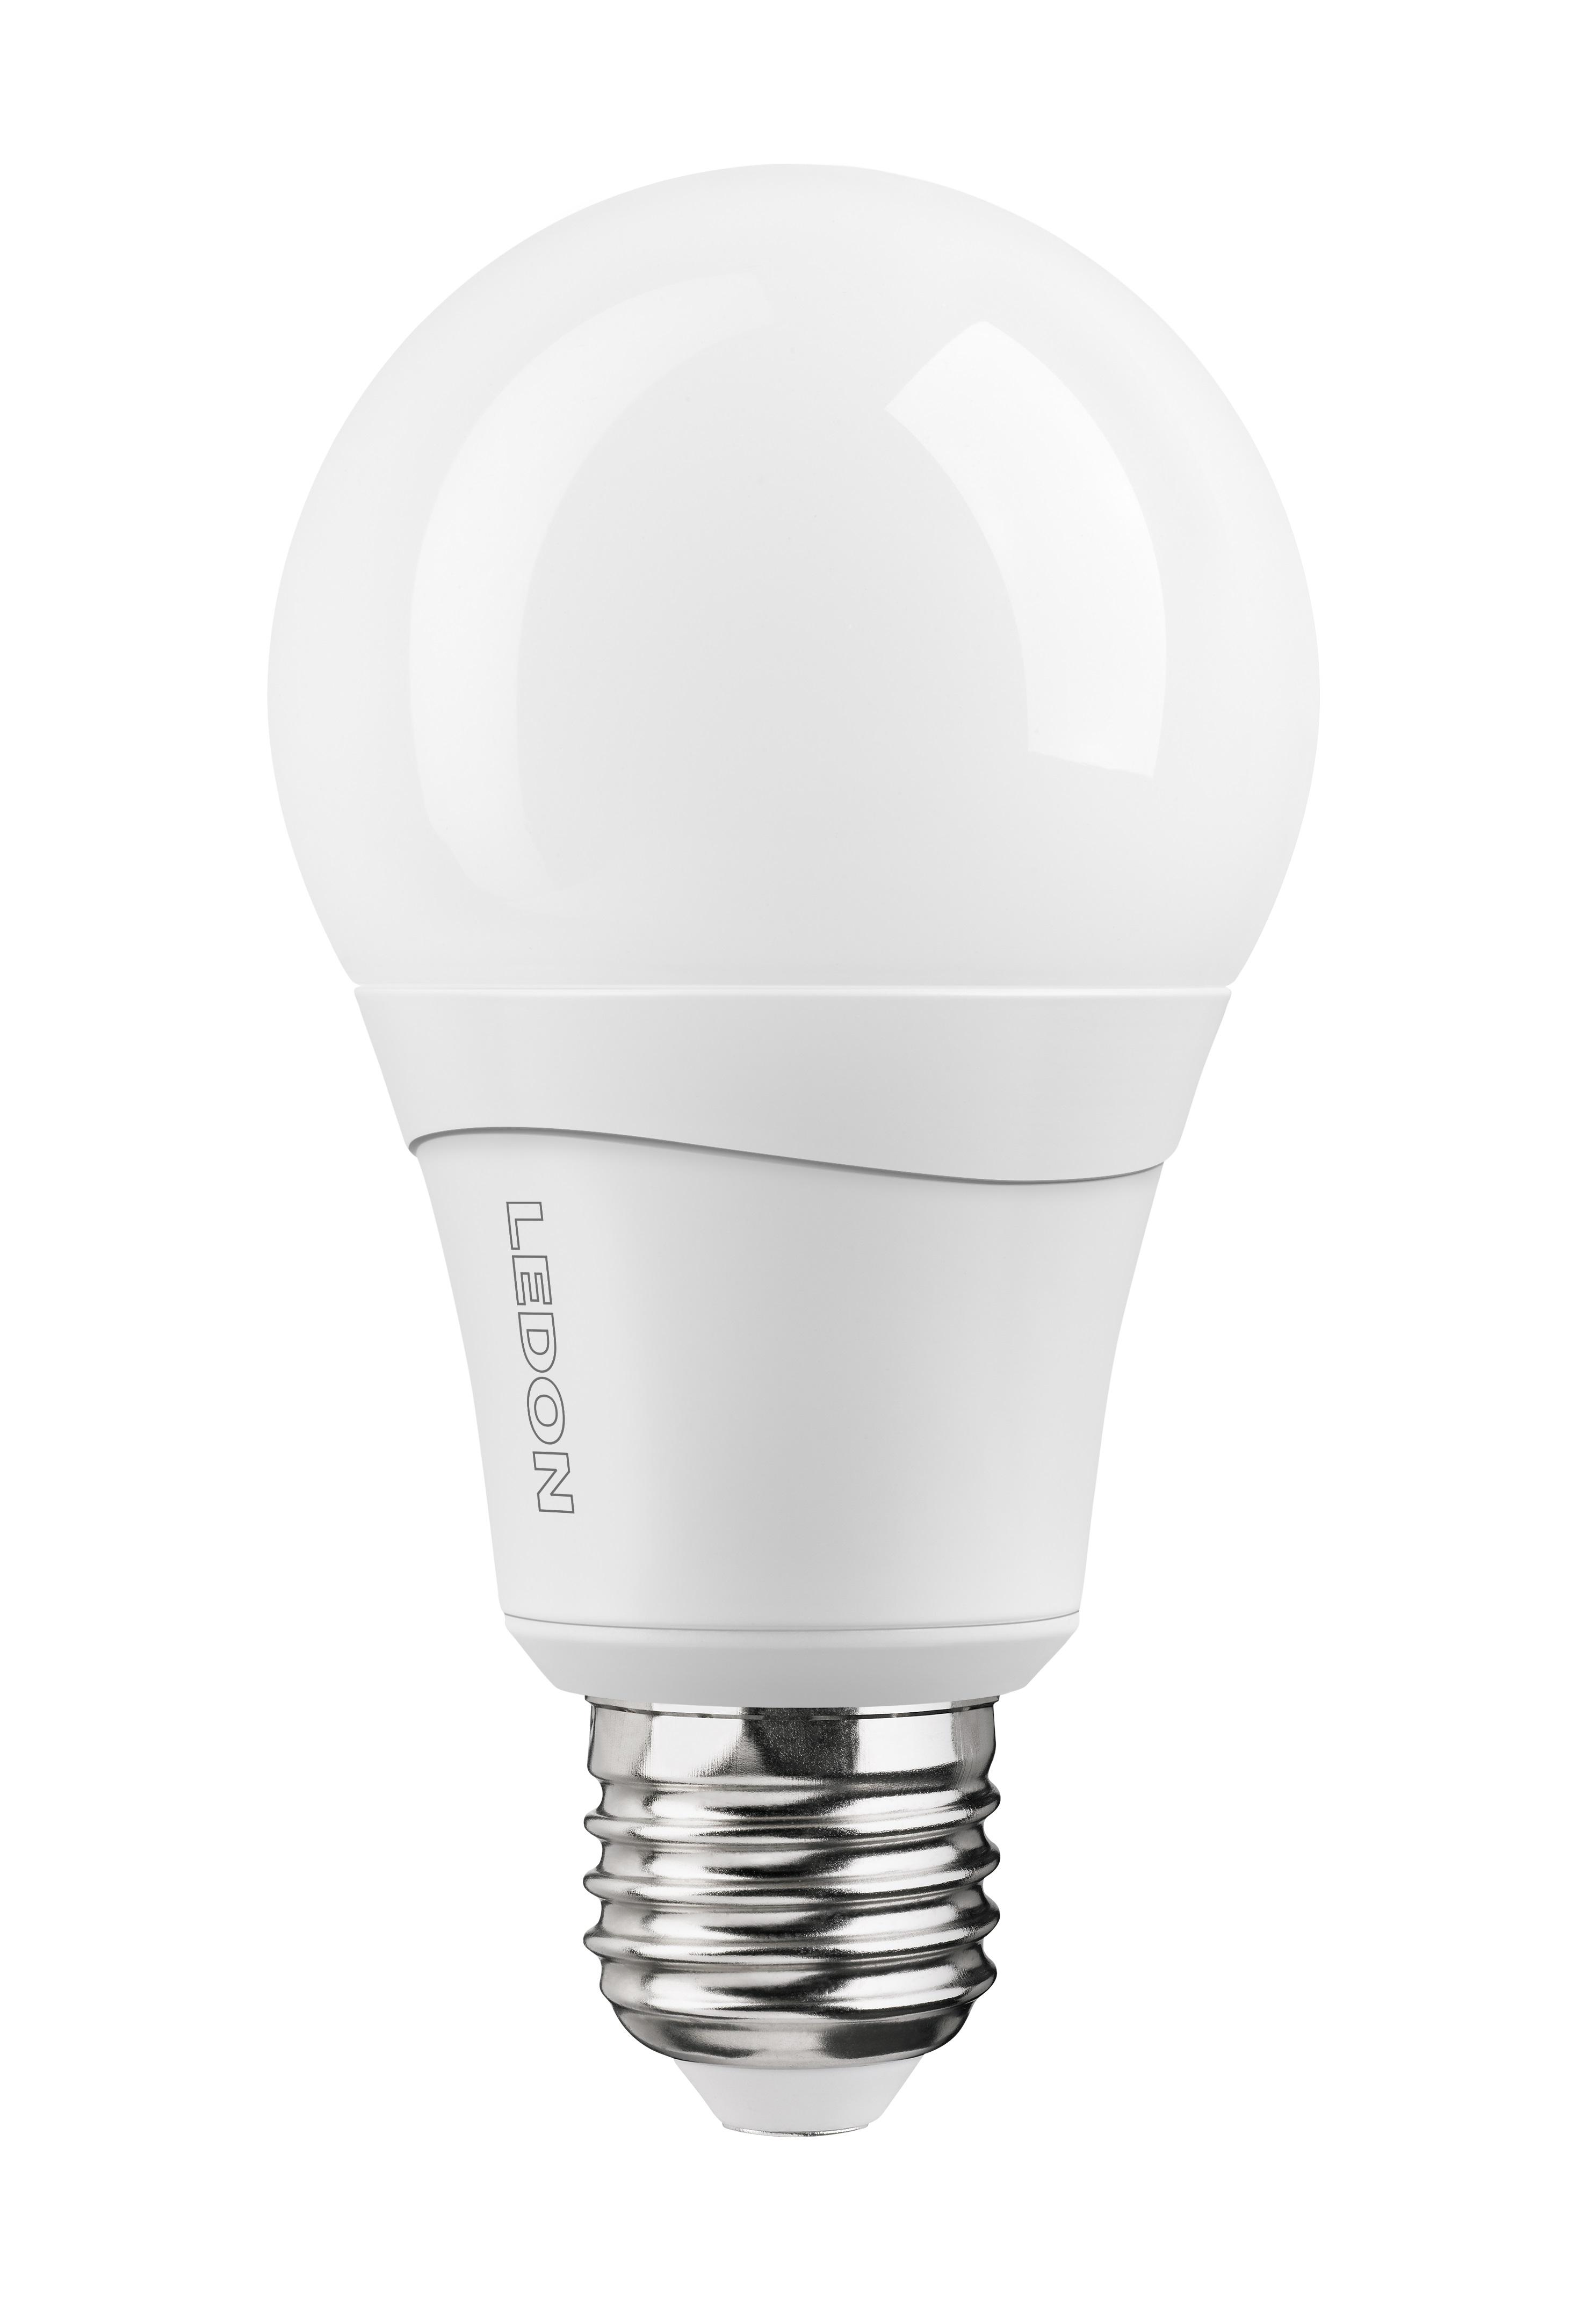 1 Stk LED Lampe A66 12.5W, 2700K, 1050lm, matt, E27, 230V, D-Cl LI29001032